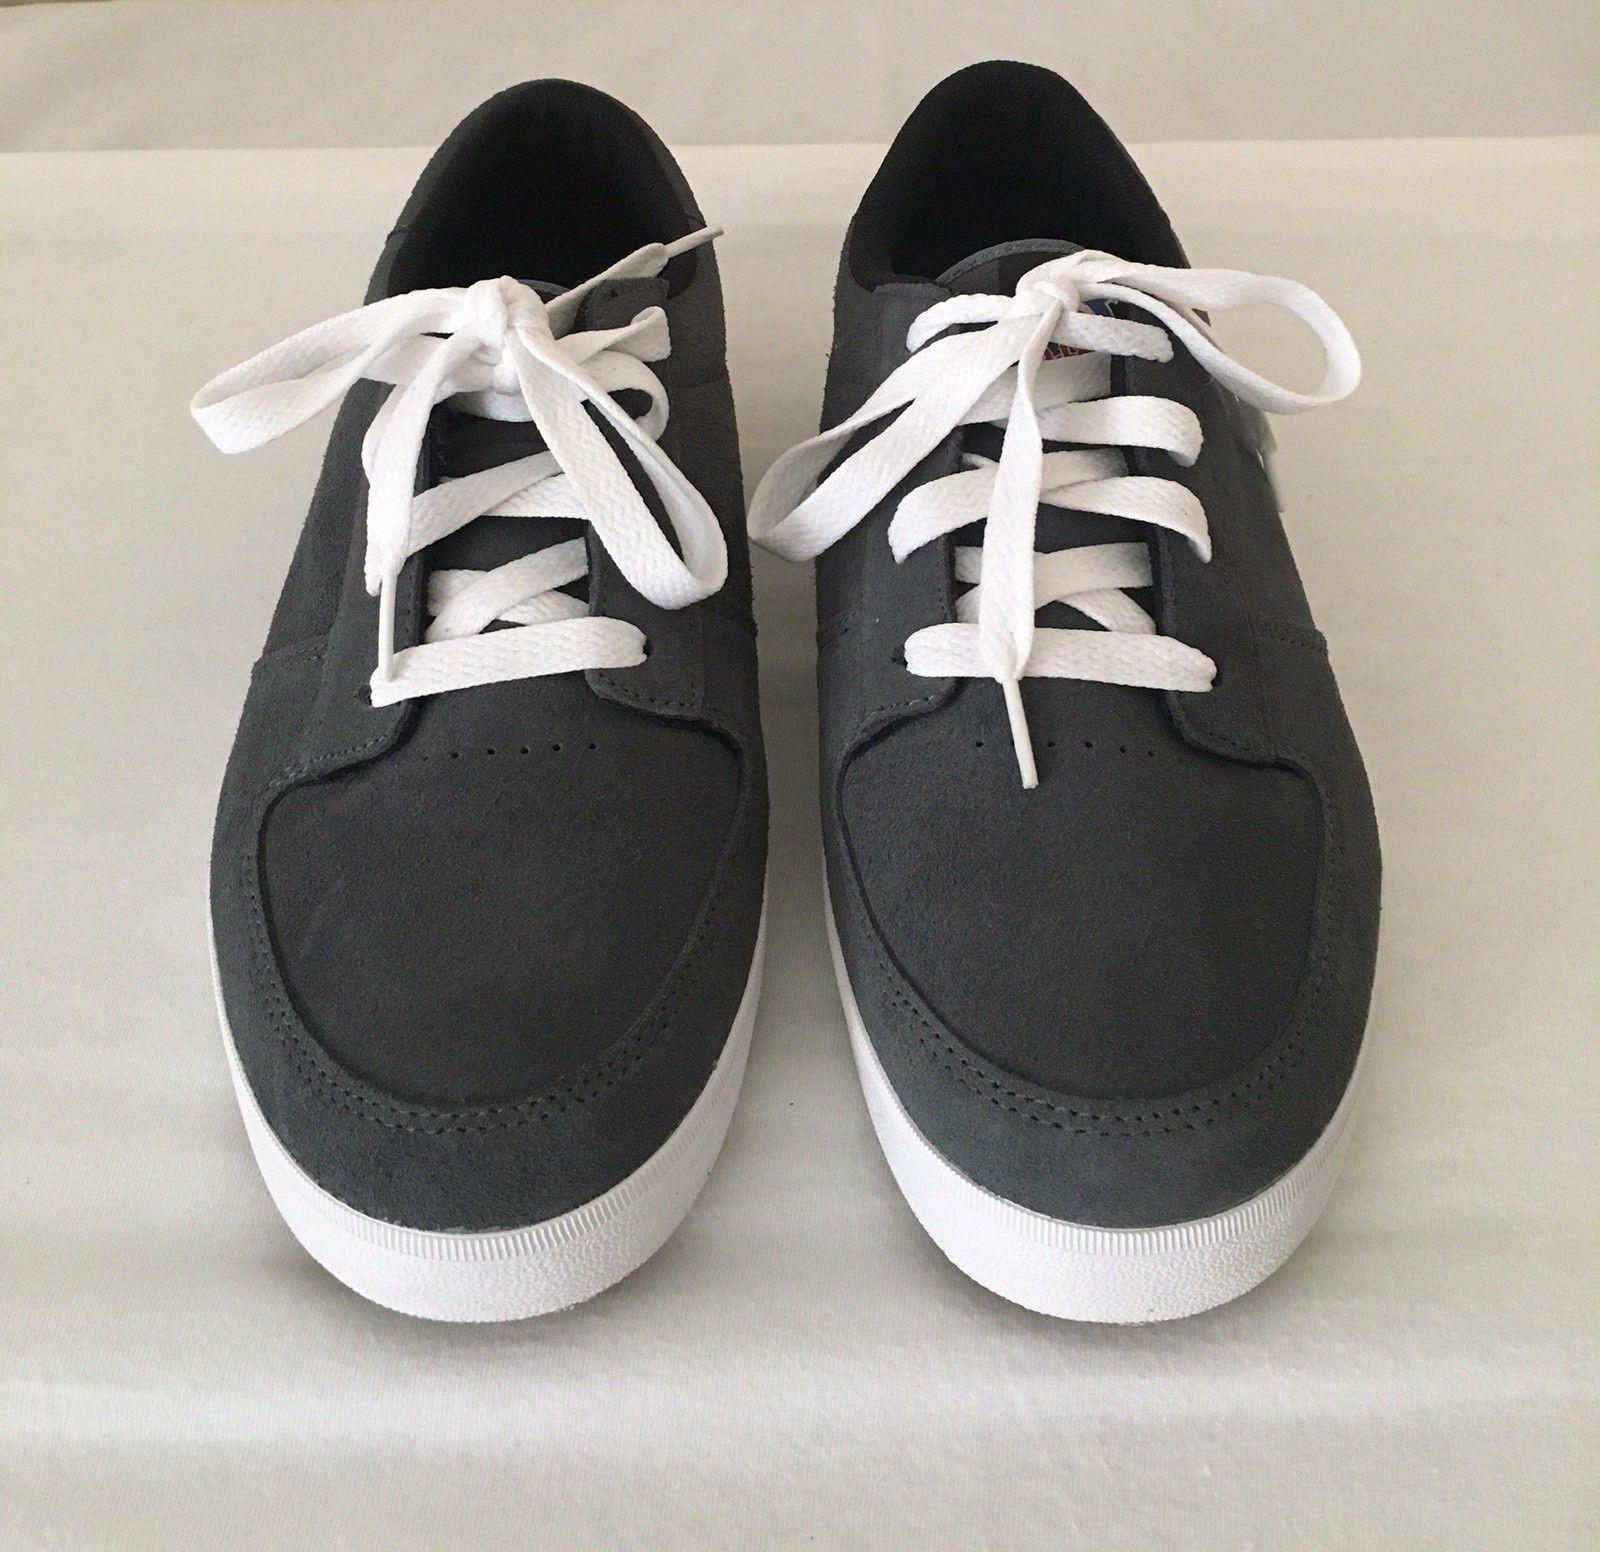 e92a5b7cf1dfe Osiris Sneaker: 6 listings